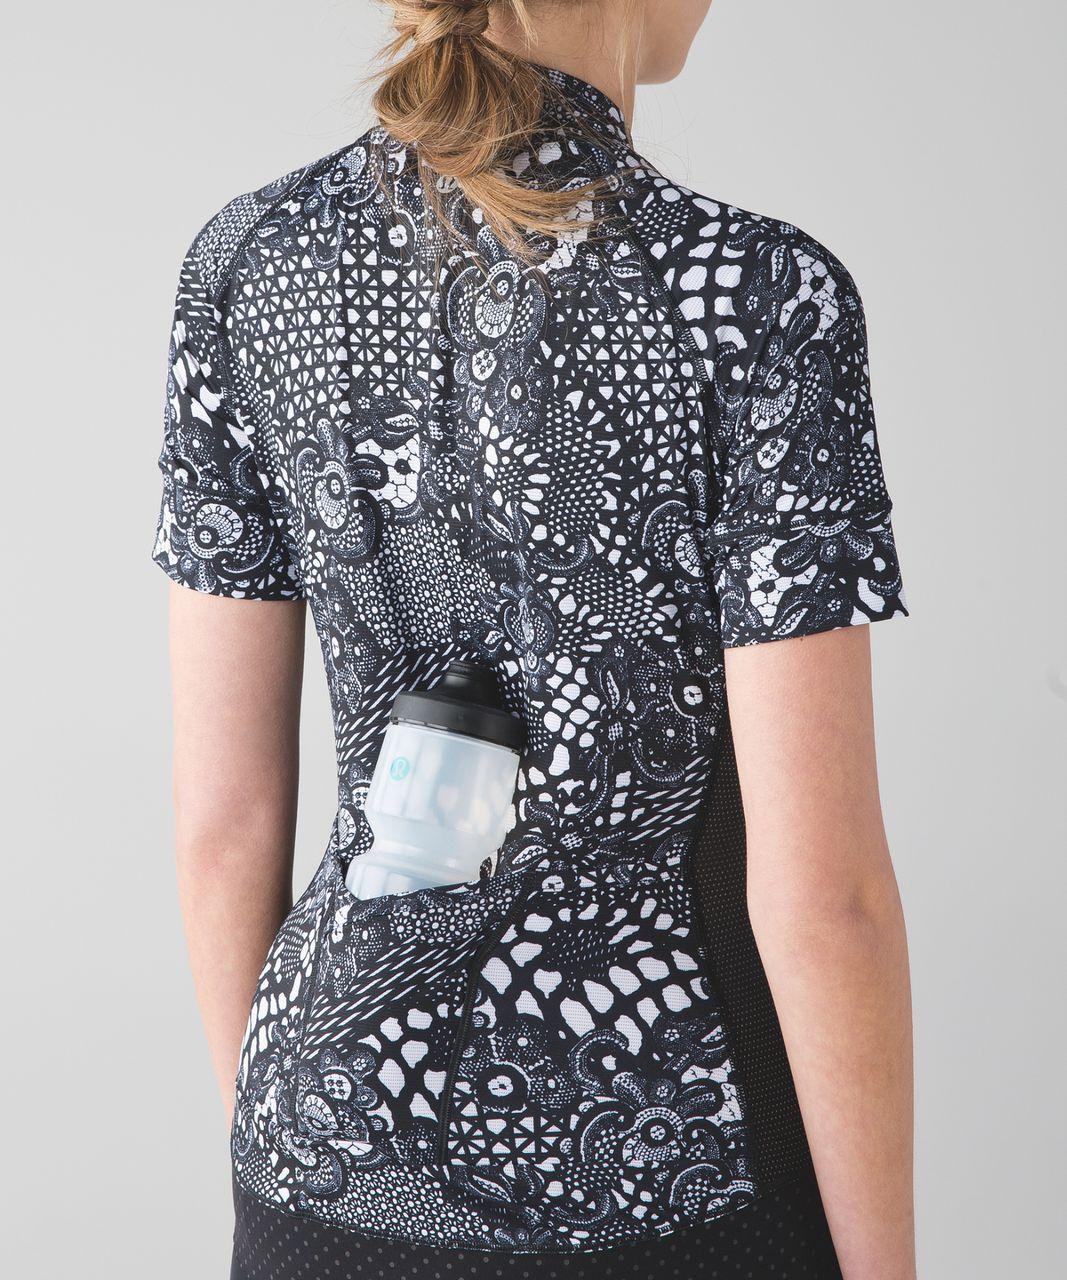 7d94e82ee Lululemon Shift Happens Jersey - Maxi Pretty Lace White Black   Black -  lulu fanatics